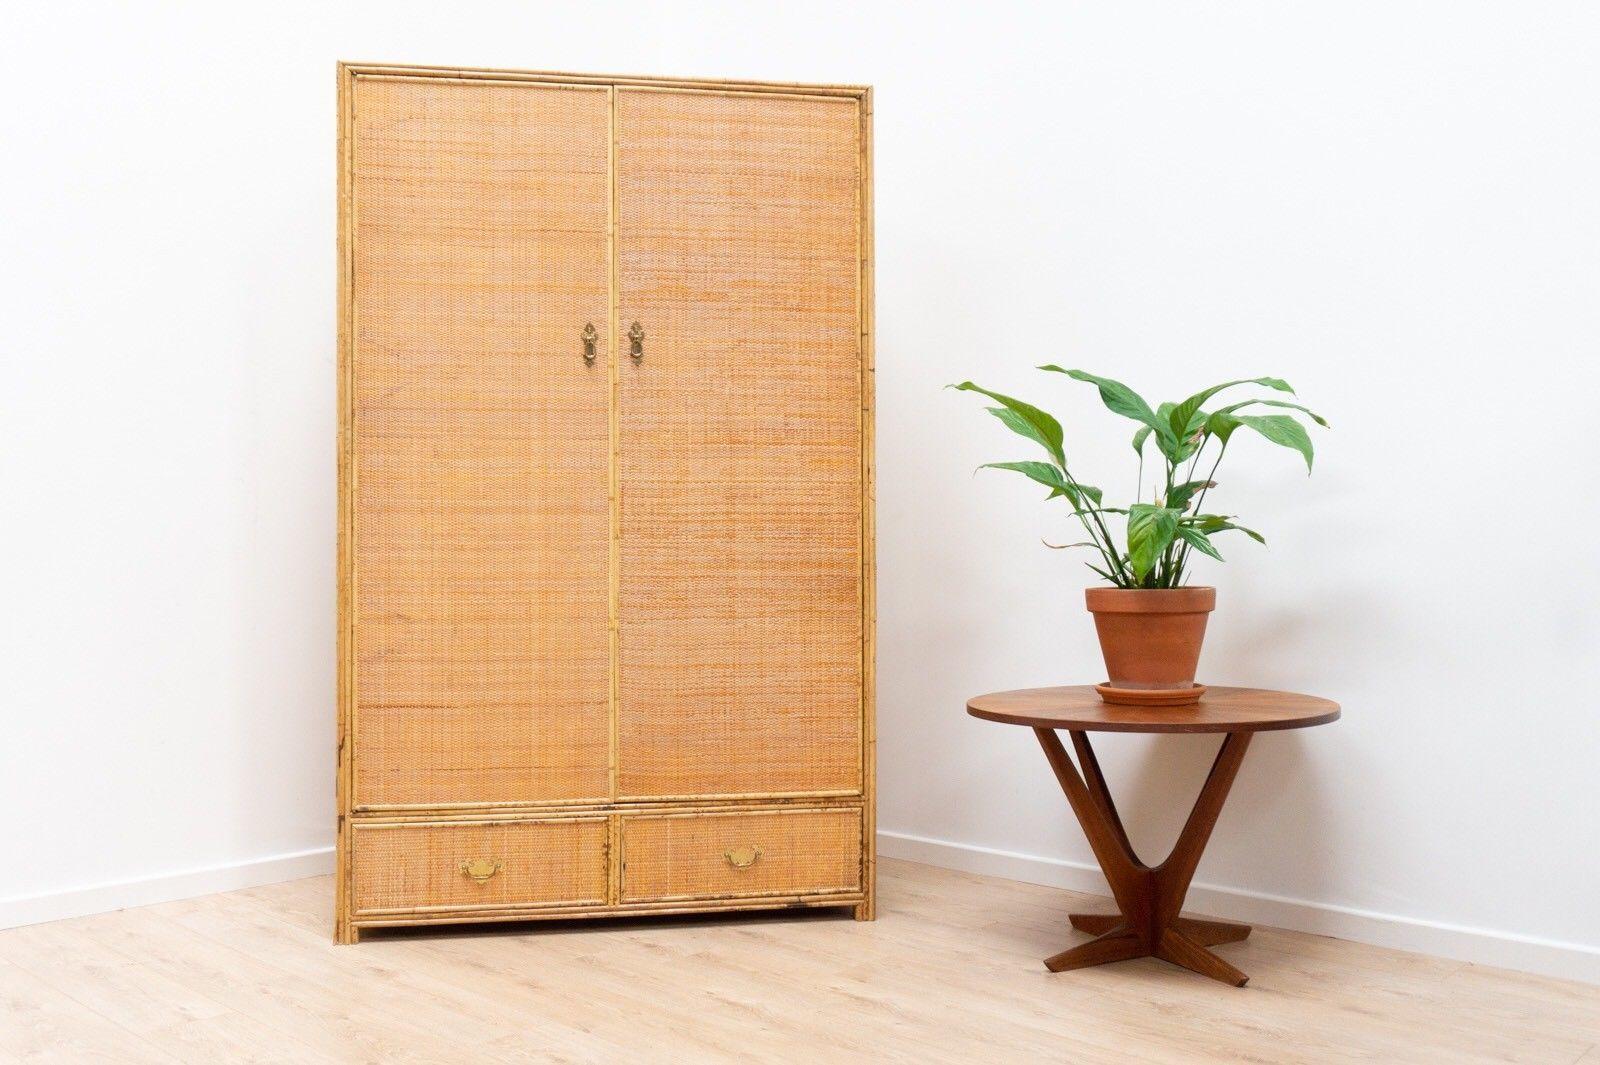 rare-vintage-mid-century-french-rattan-bamboo-wardrobe-heals